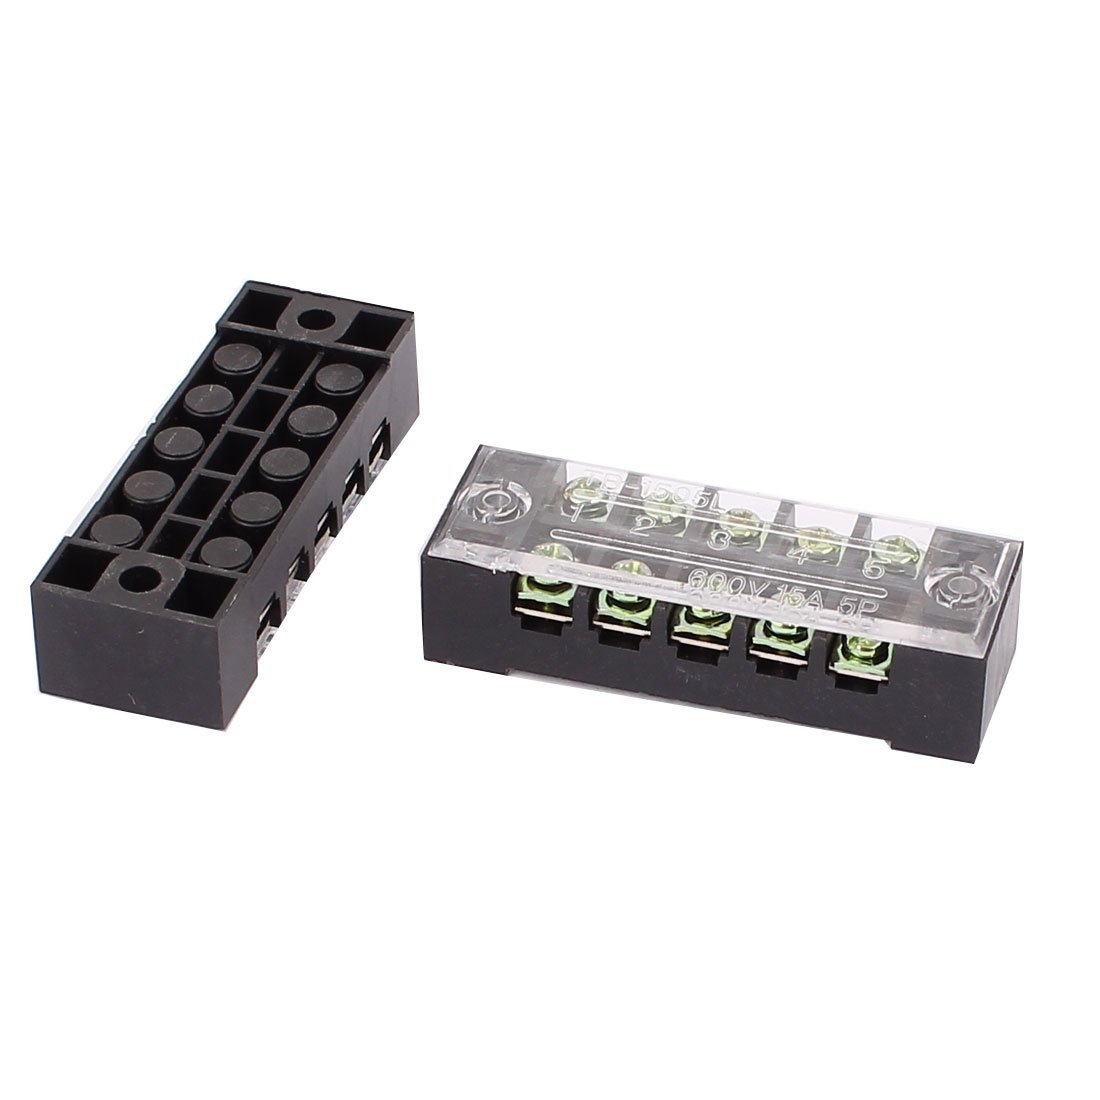 Aexit 2 Pcs 600V 15A 5P Dual Row Barrier Terminal Block Wire Connector Bar